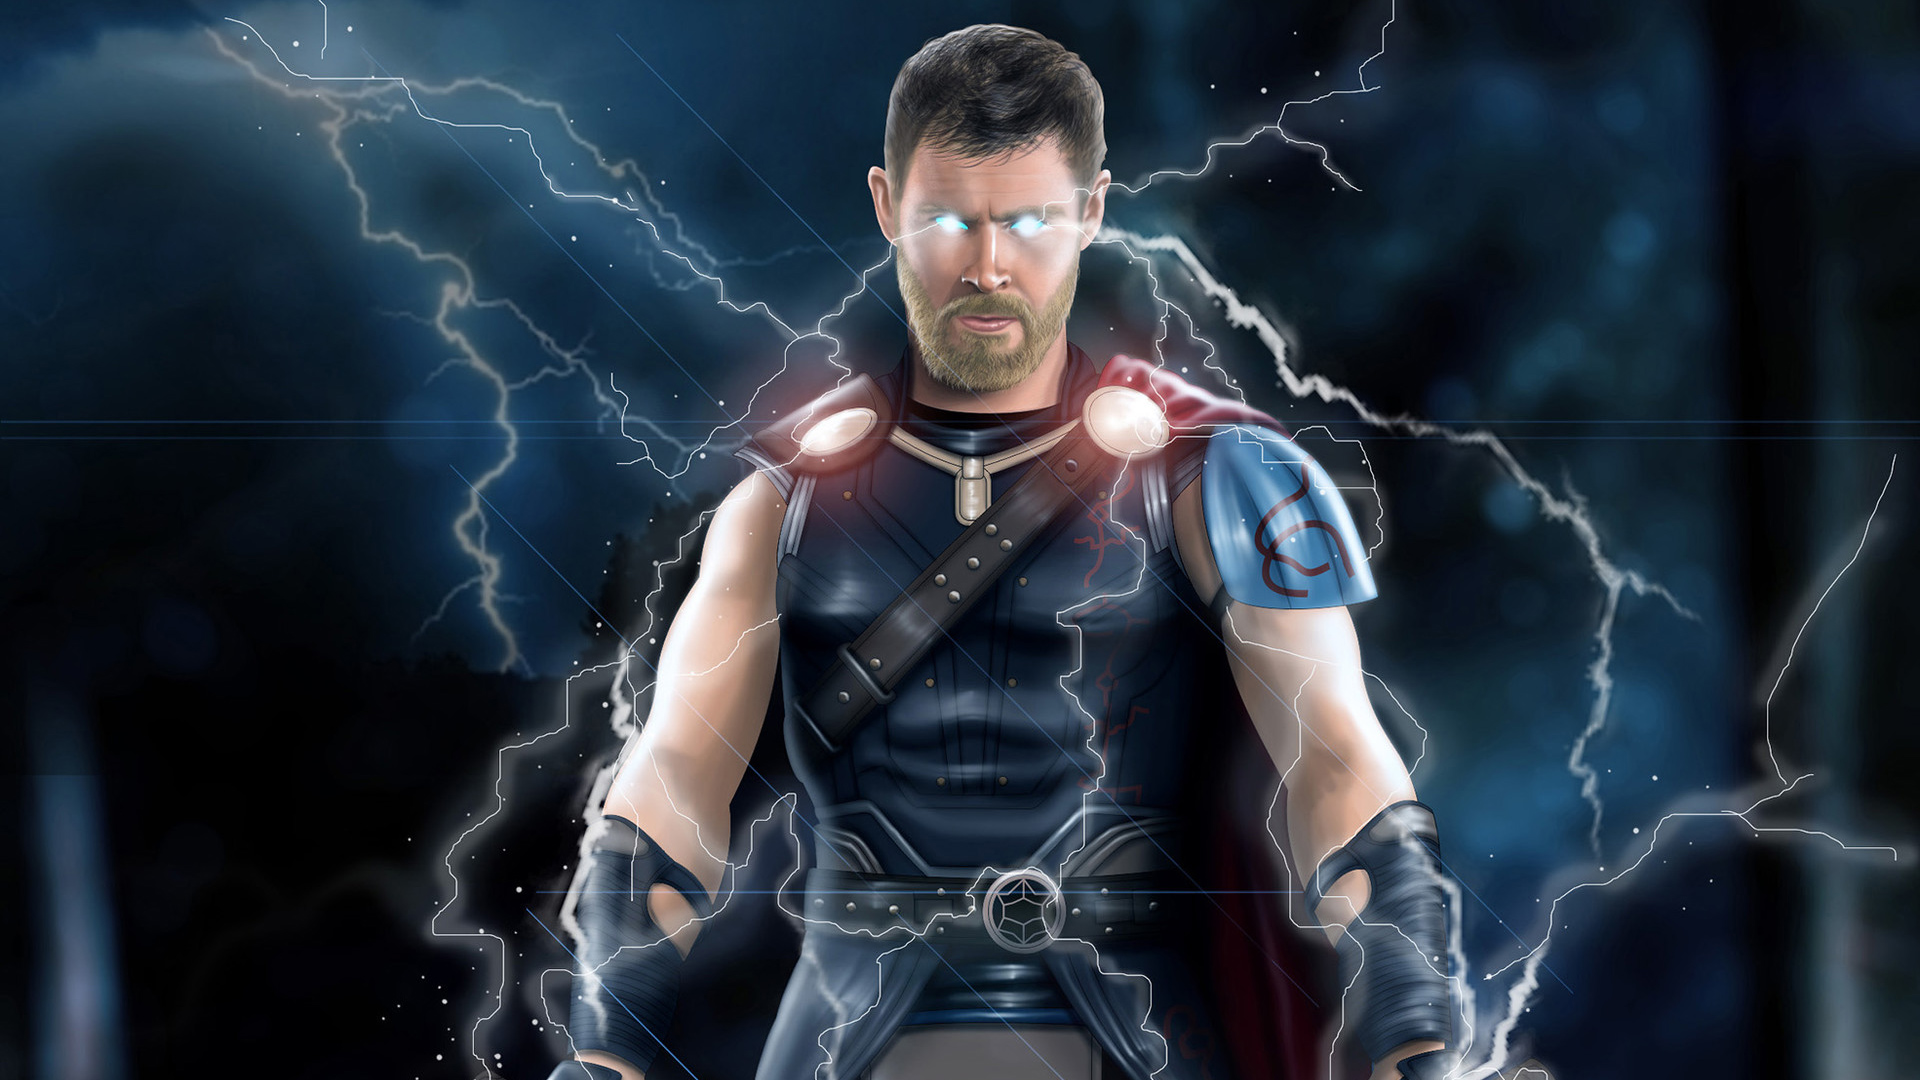 Thor Ragnarok Movie Artworks, HD Superheroes, 4k ...